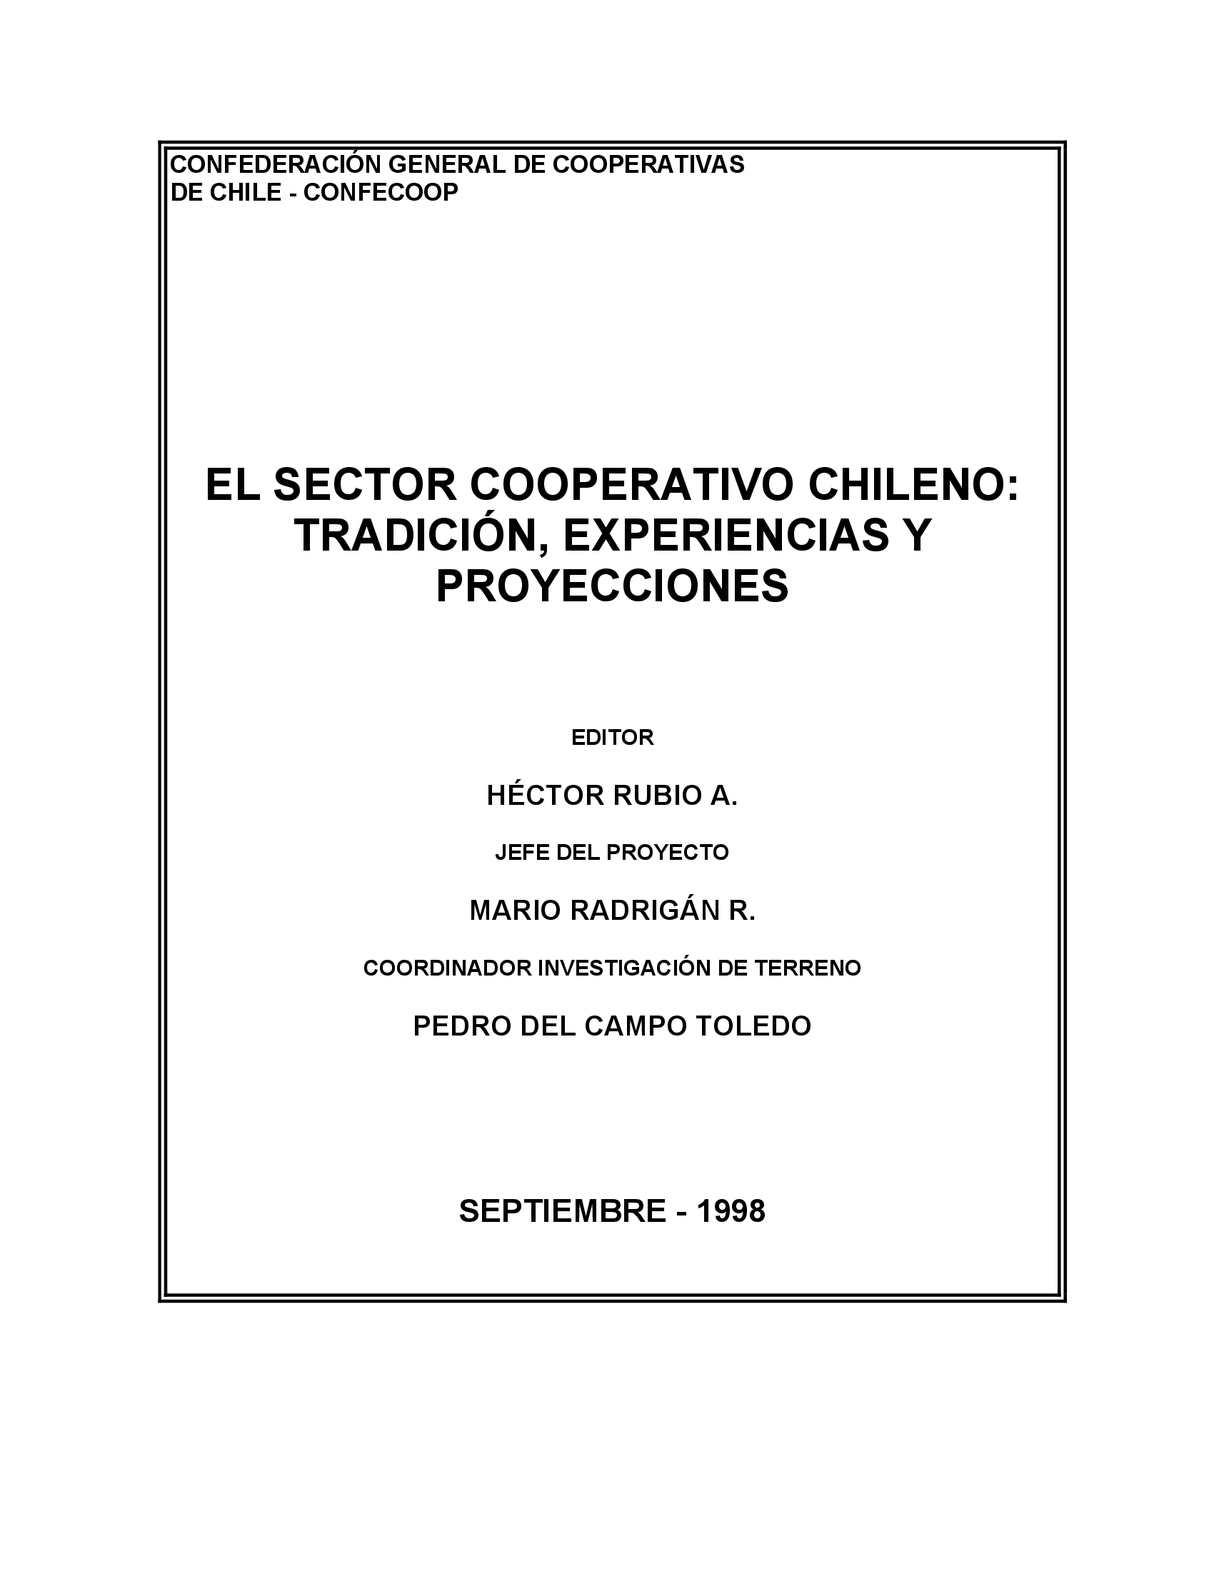 Calaméo - MarioRadrigán- Trayectoria Cooperativas En Chile - 1998